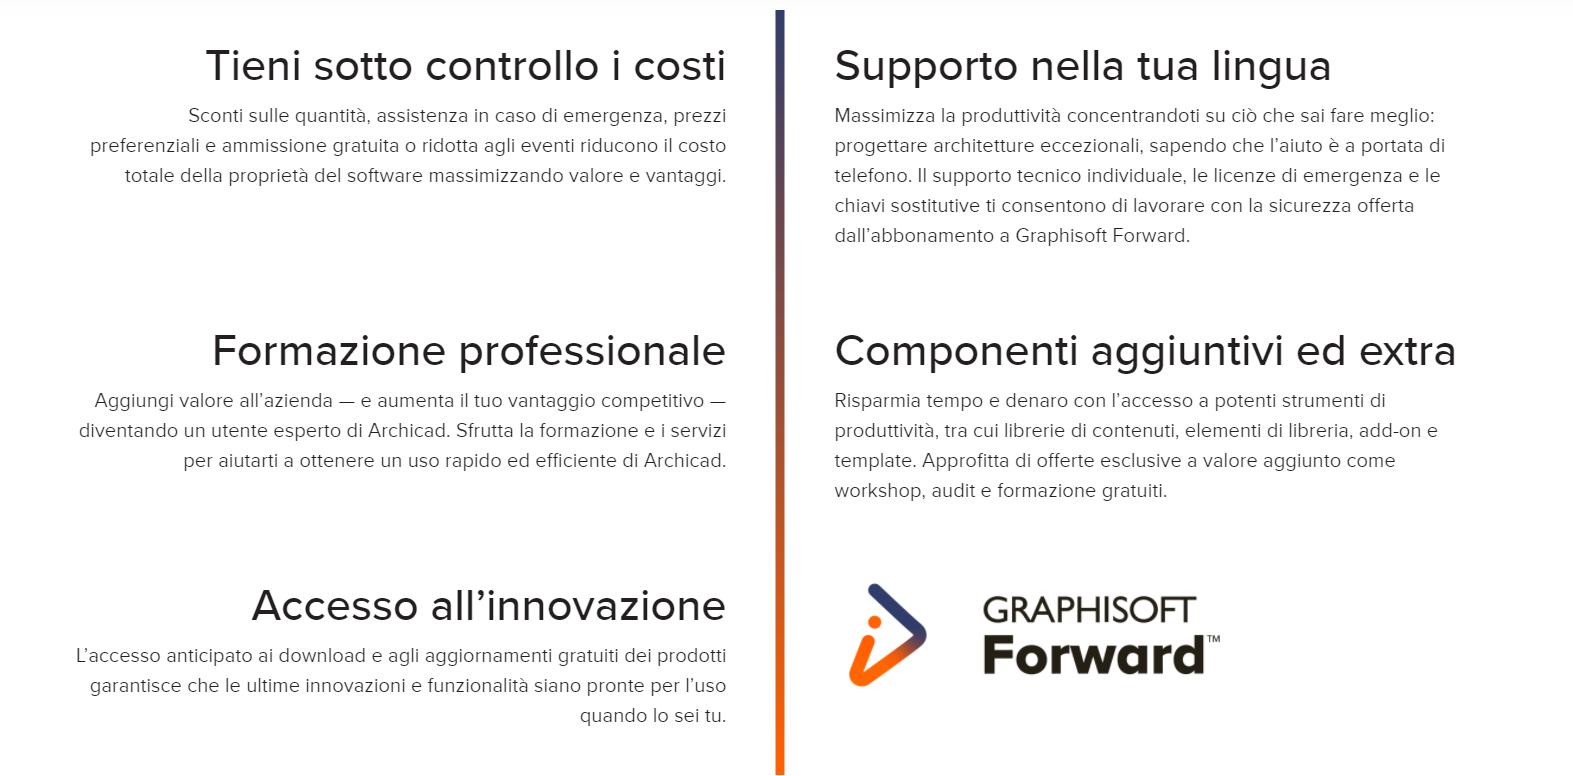 graphisoft-forward-cdaa-assistenza graphisoft-graphisoft italia-servizi-tecno 3d-rivendita software-bim-archicad